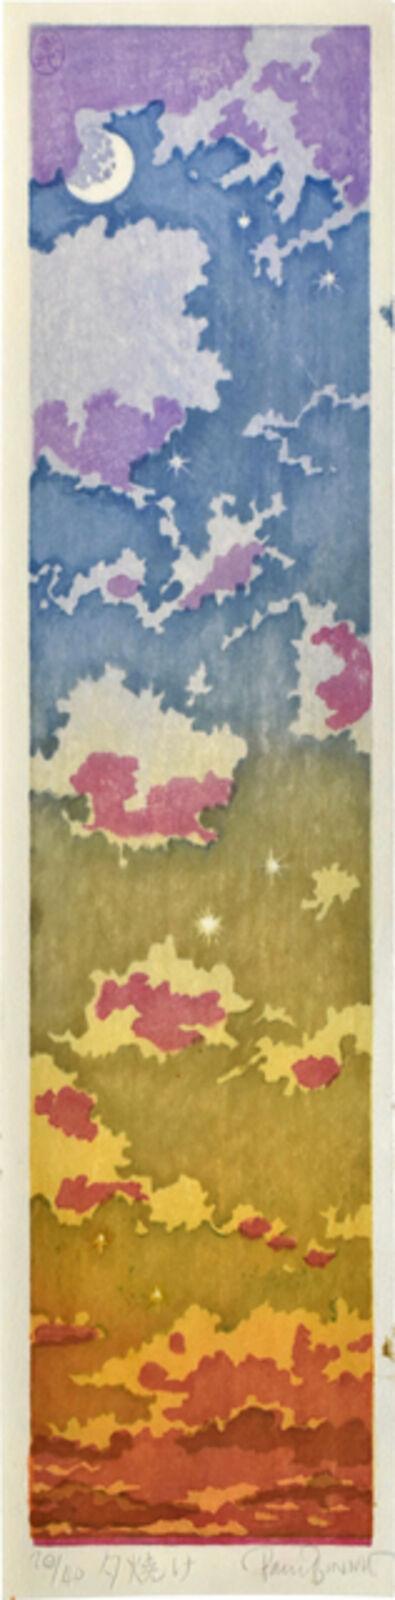 Paul Binnie, 'Afterglow (Yuyake)', 2009